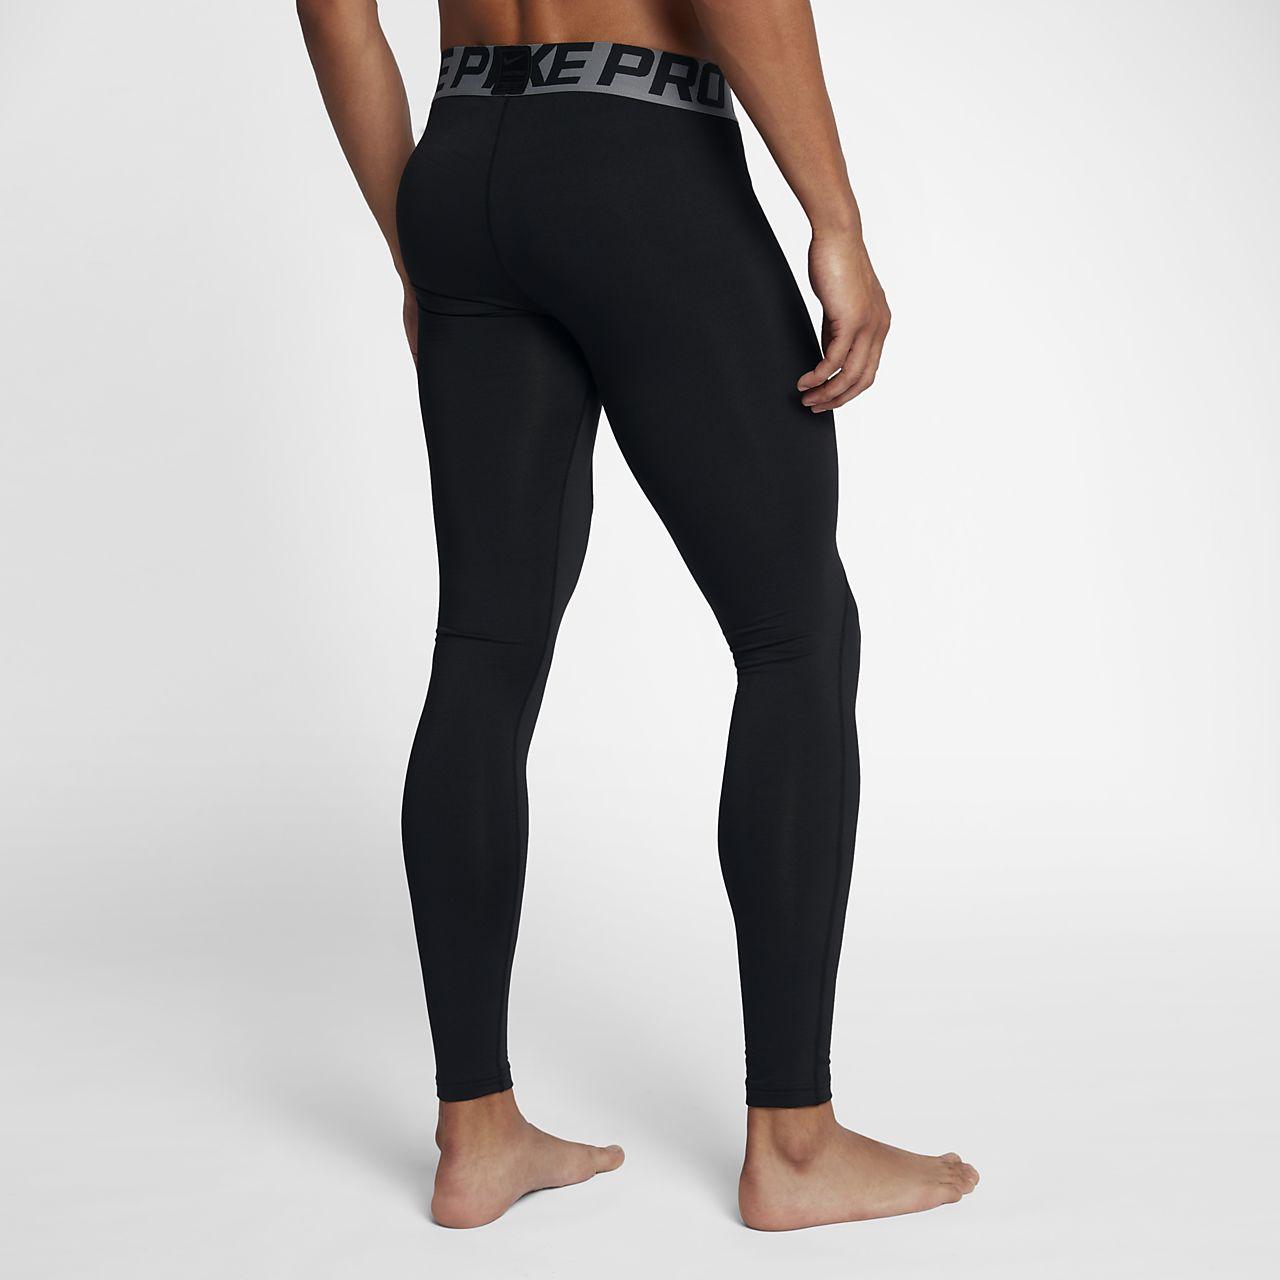 cheaper 93406 a26ce Nike Pro Warm Mens Training Tights ...